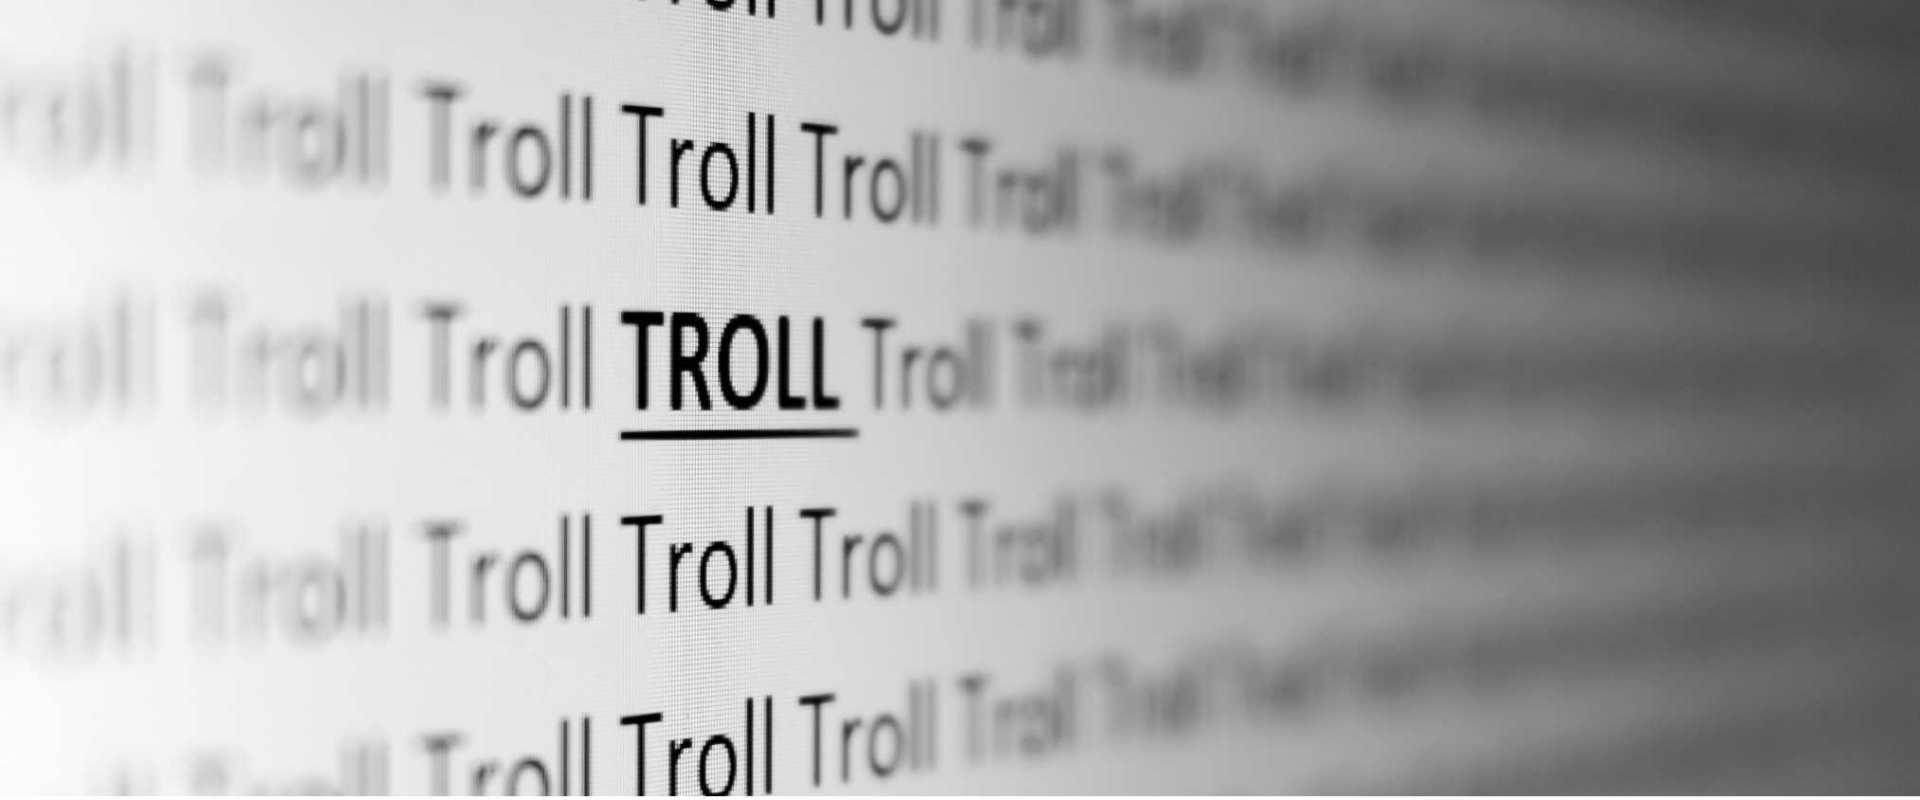 troll nedir